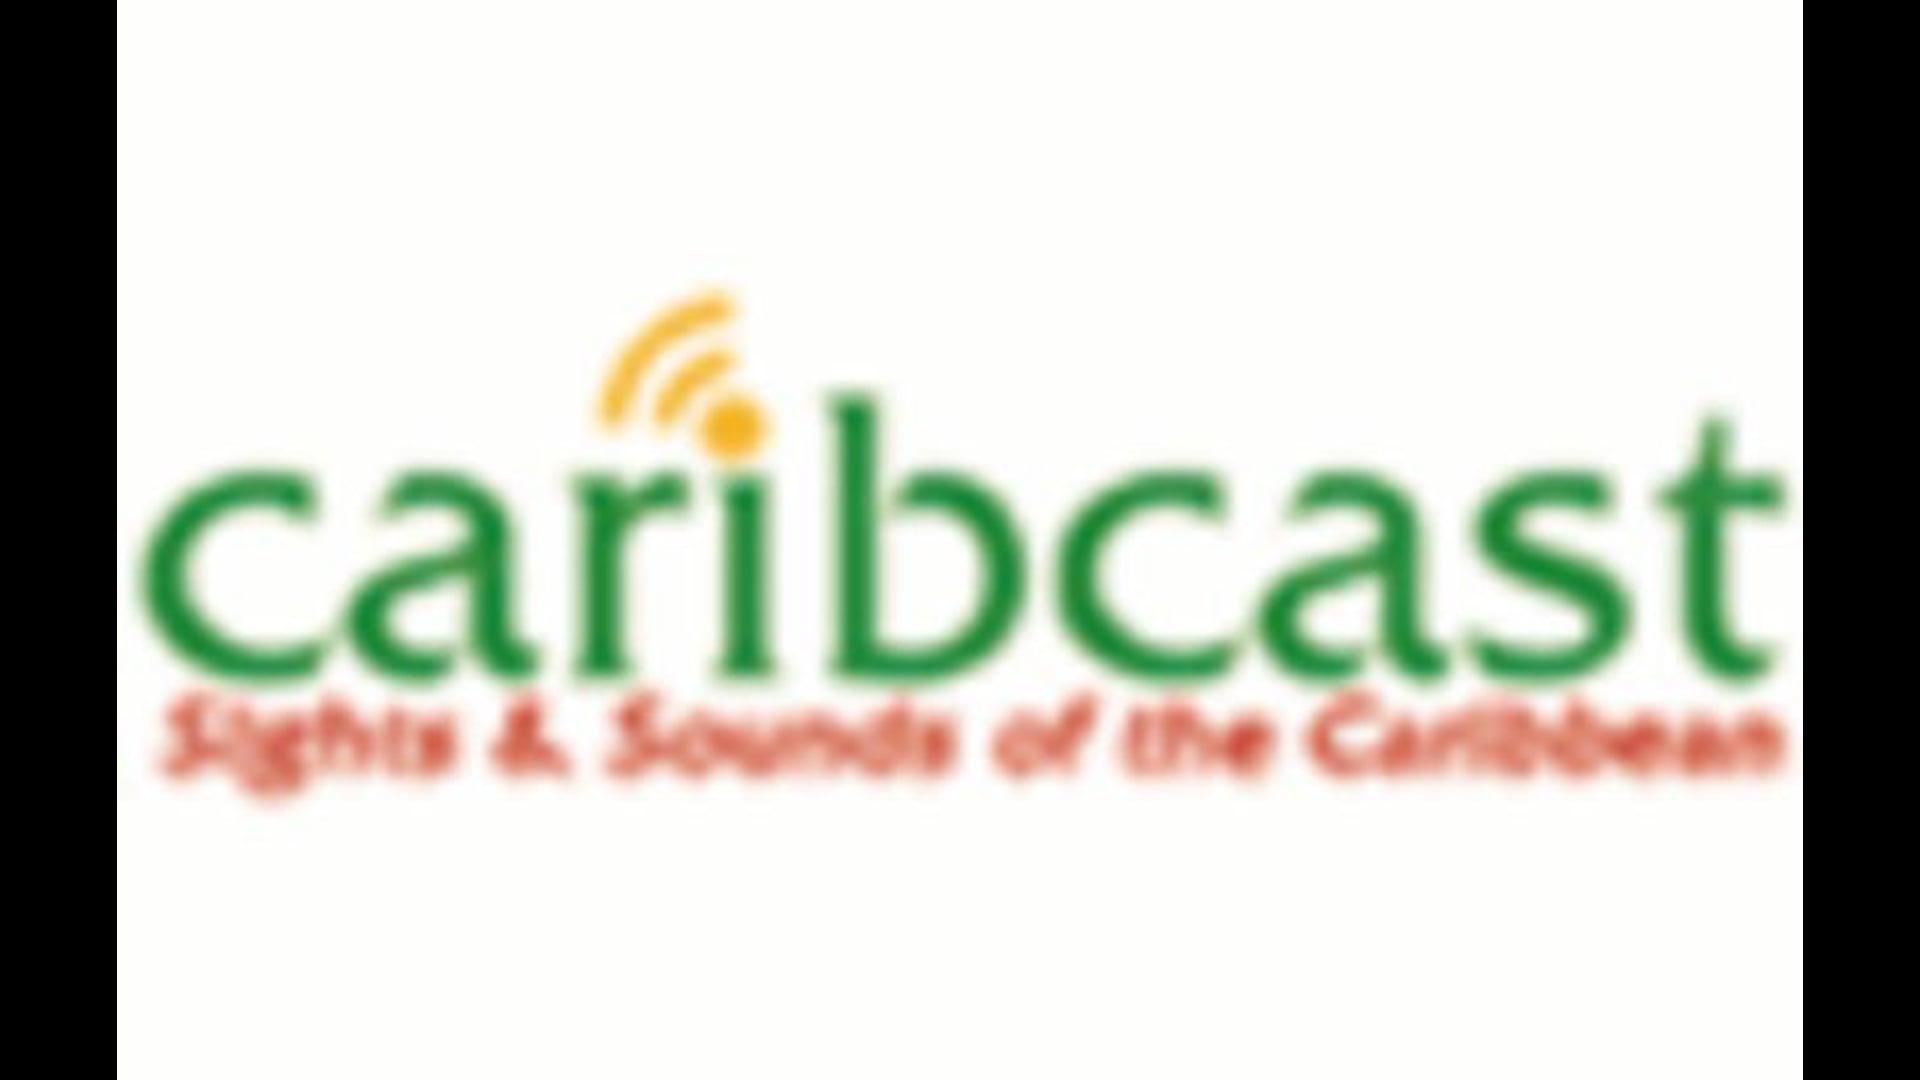 CARIBCAST.TV BY VISION